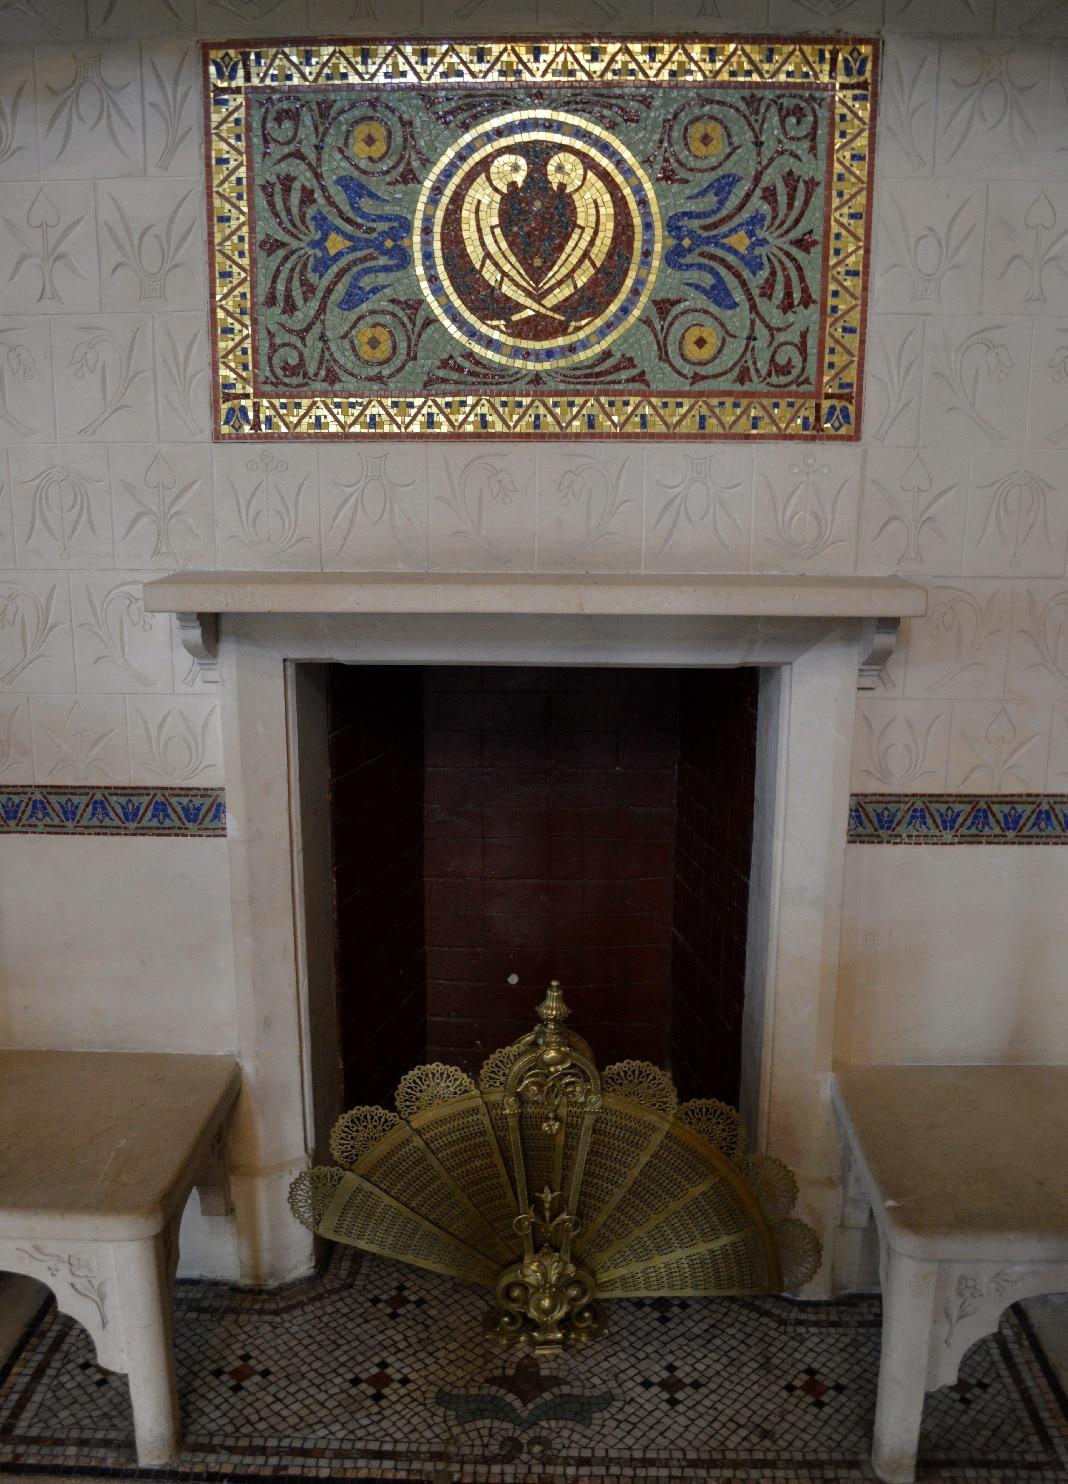 Elemente decorative ce redau aerul boieresc al vremii